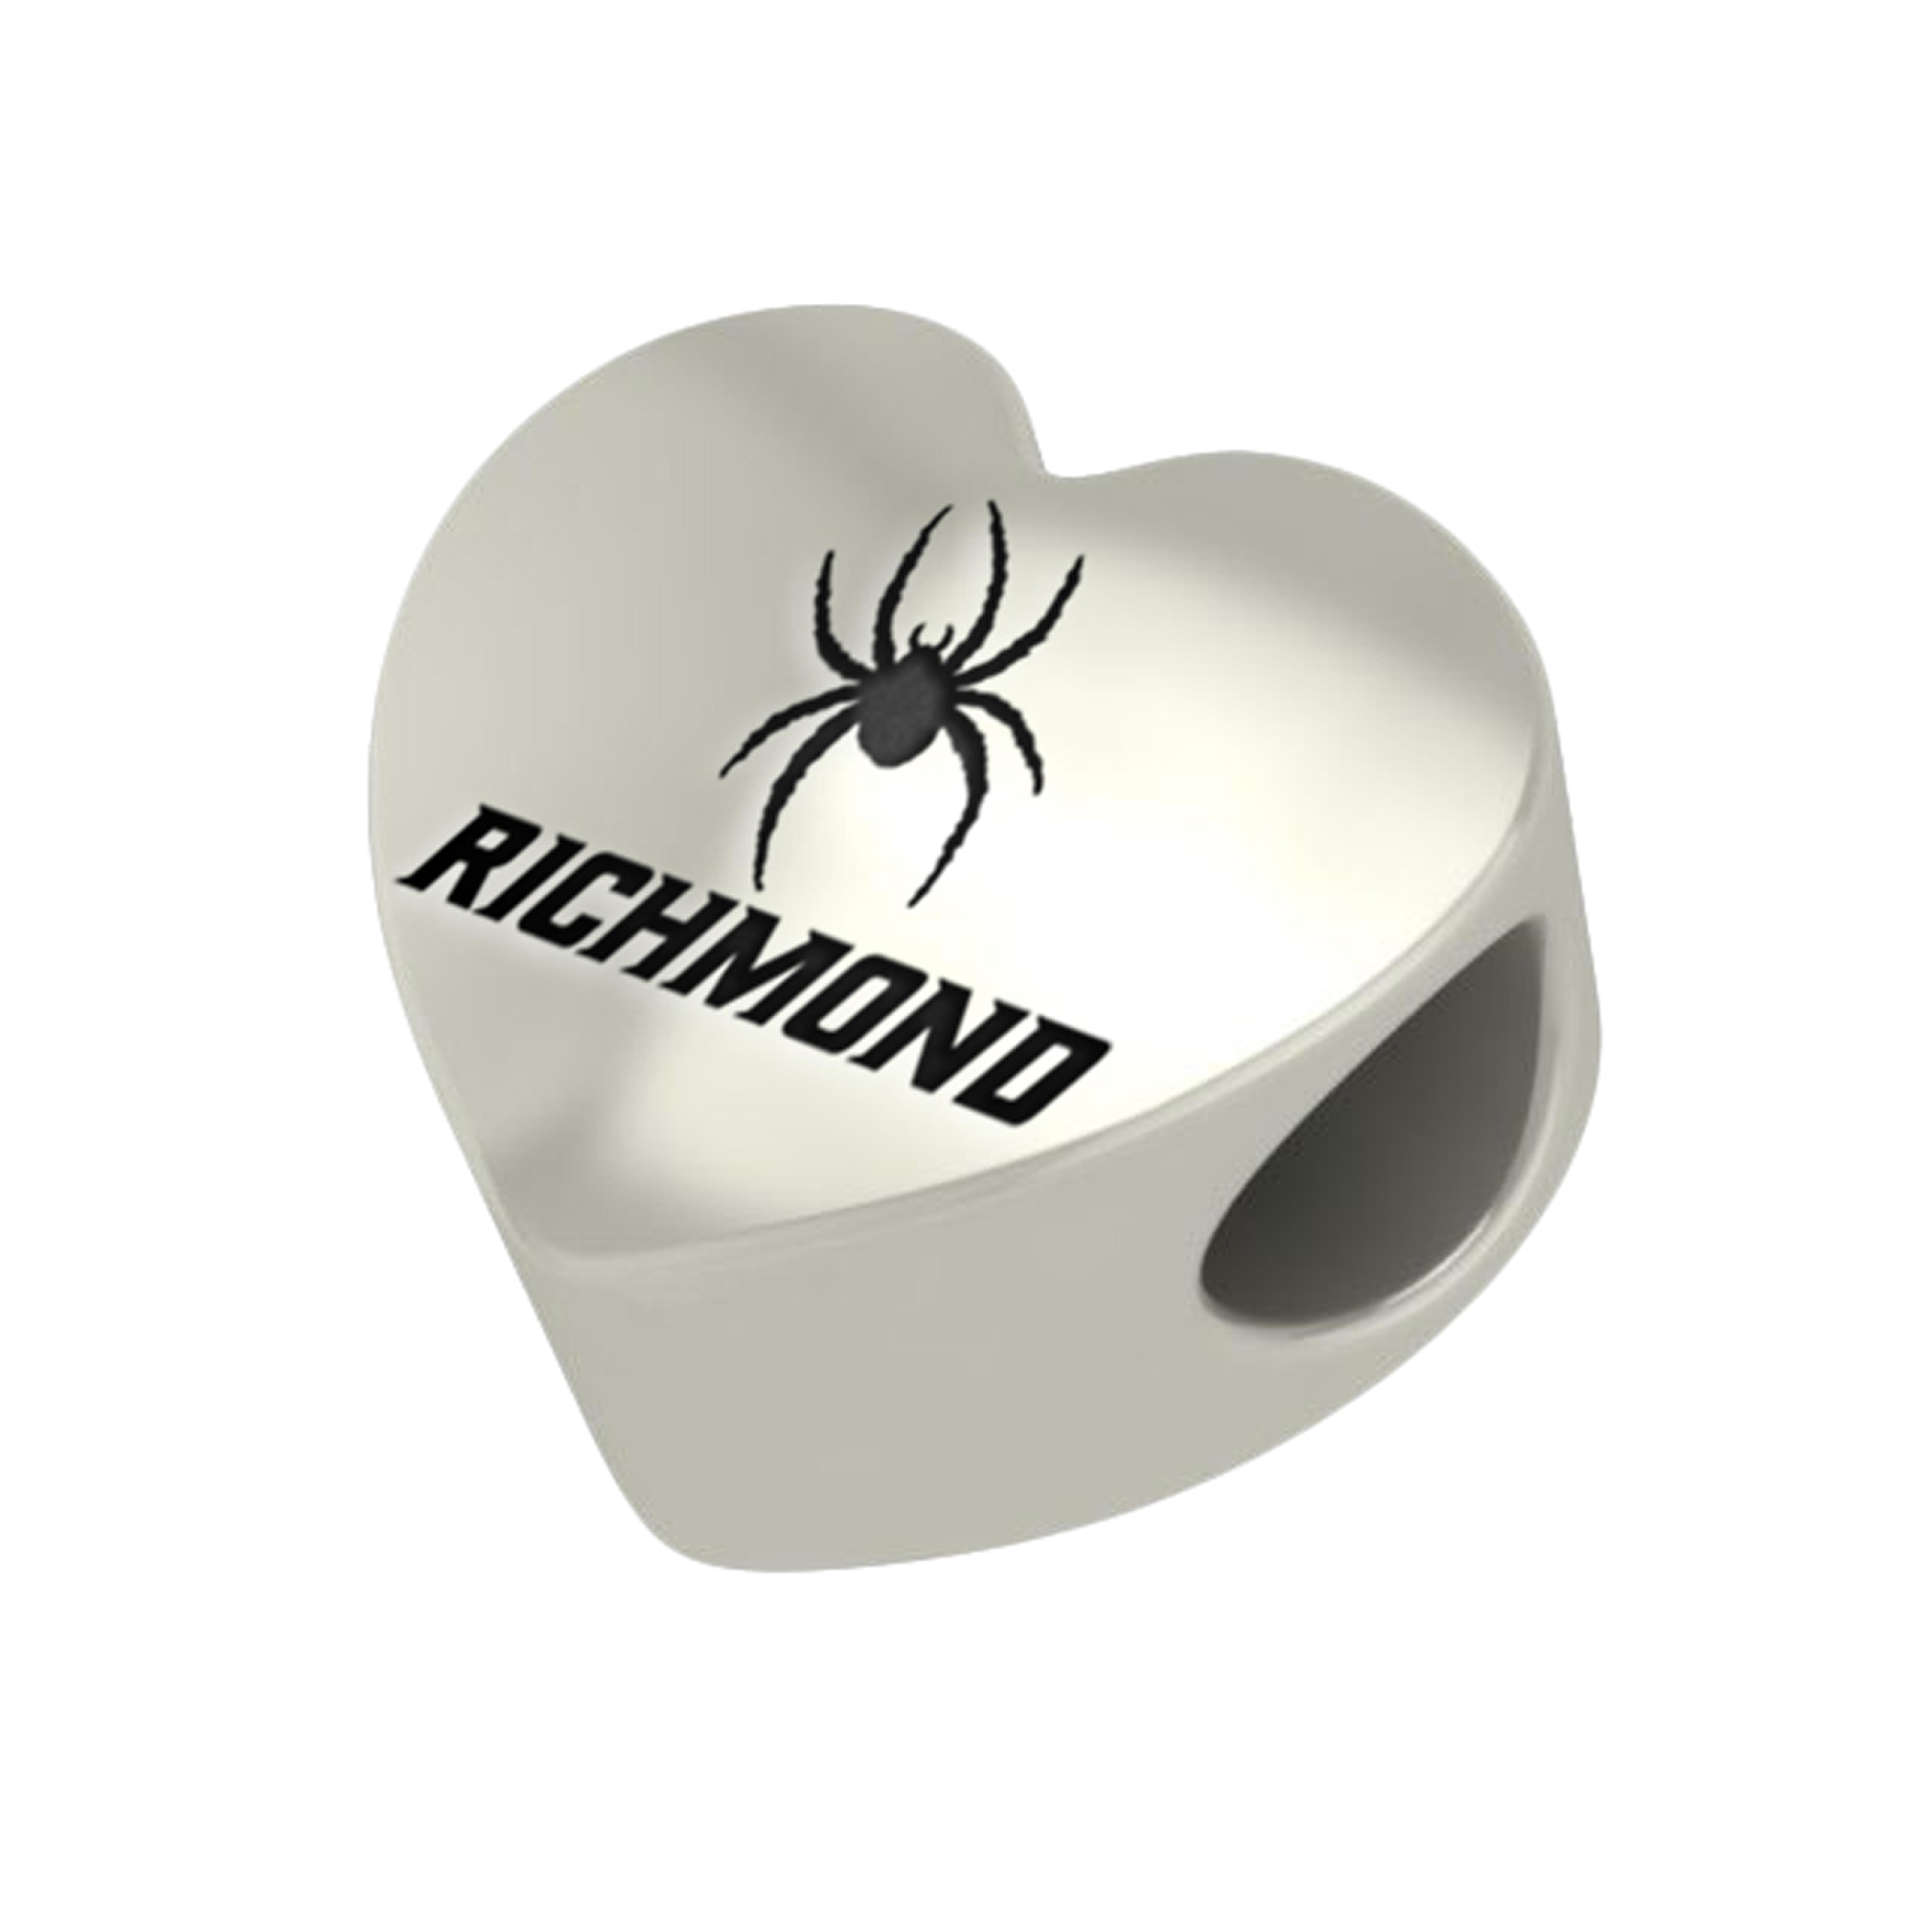 University of Richmond Heart Shaped Bead